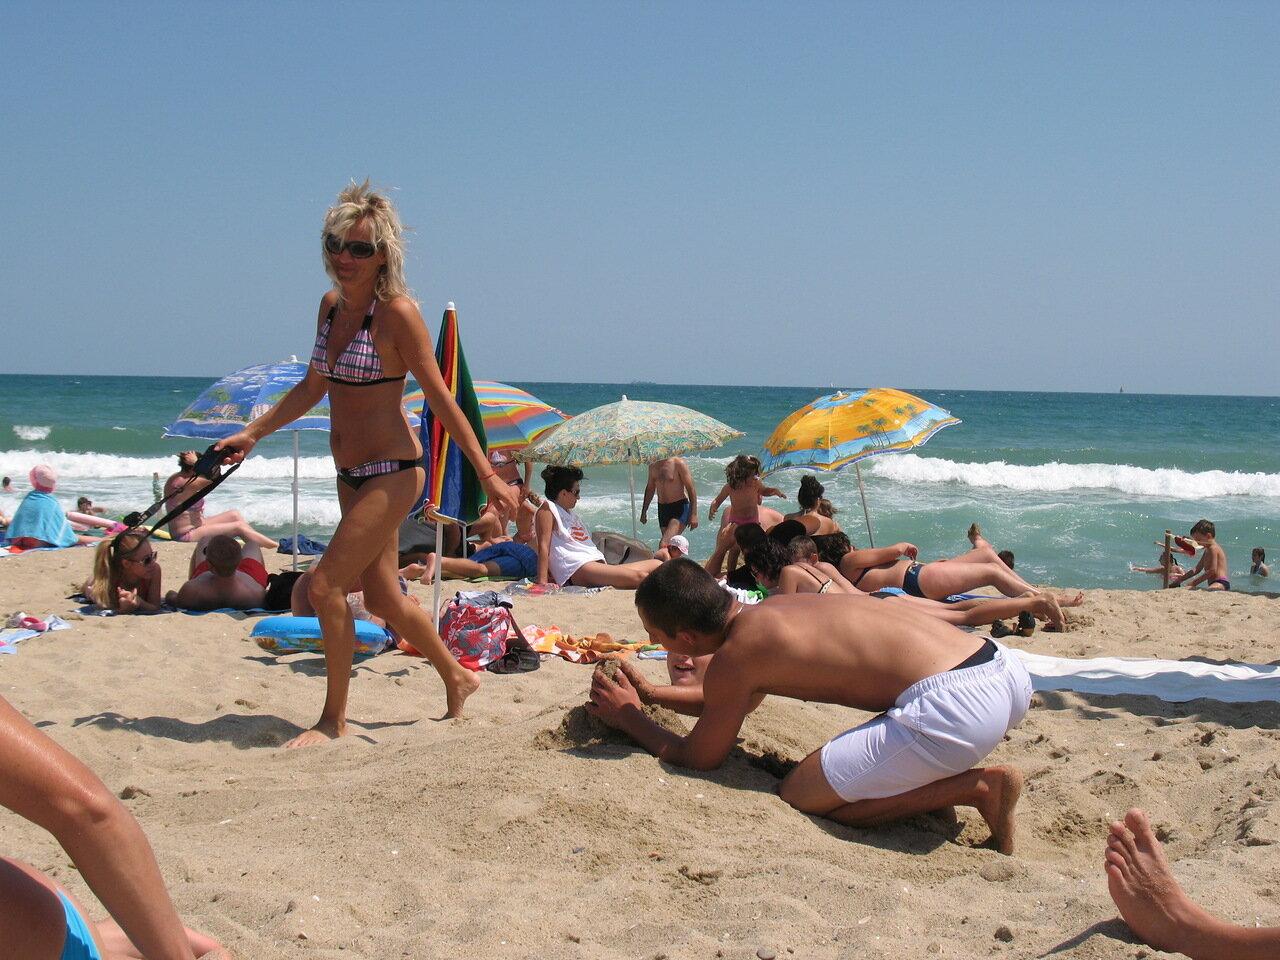 пляжи болгарии фото туристов